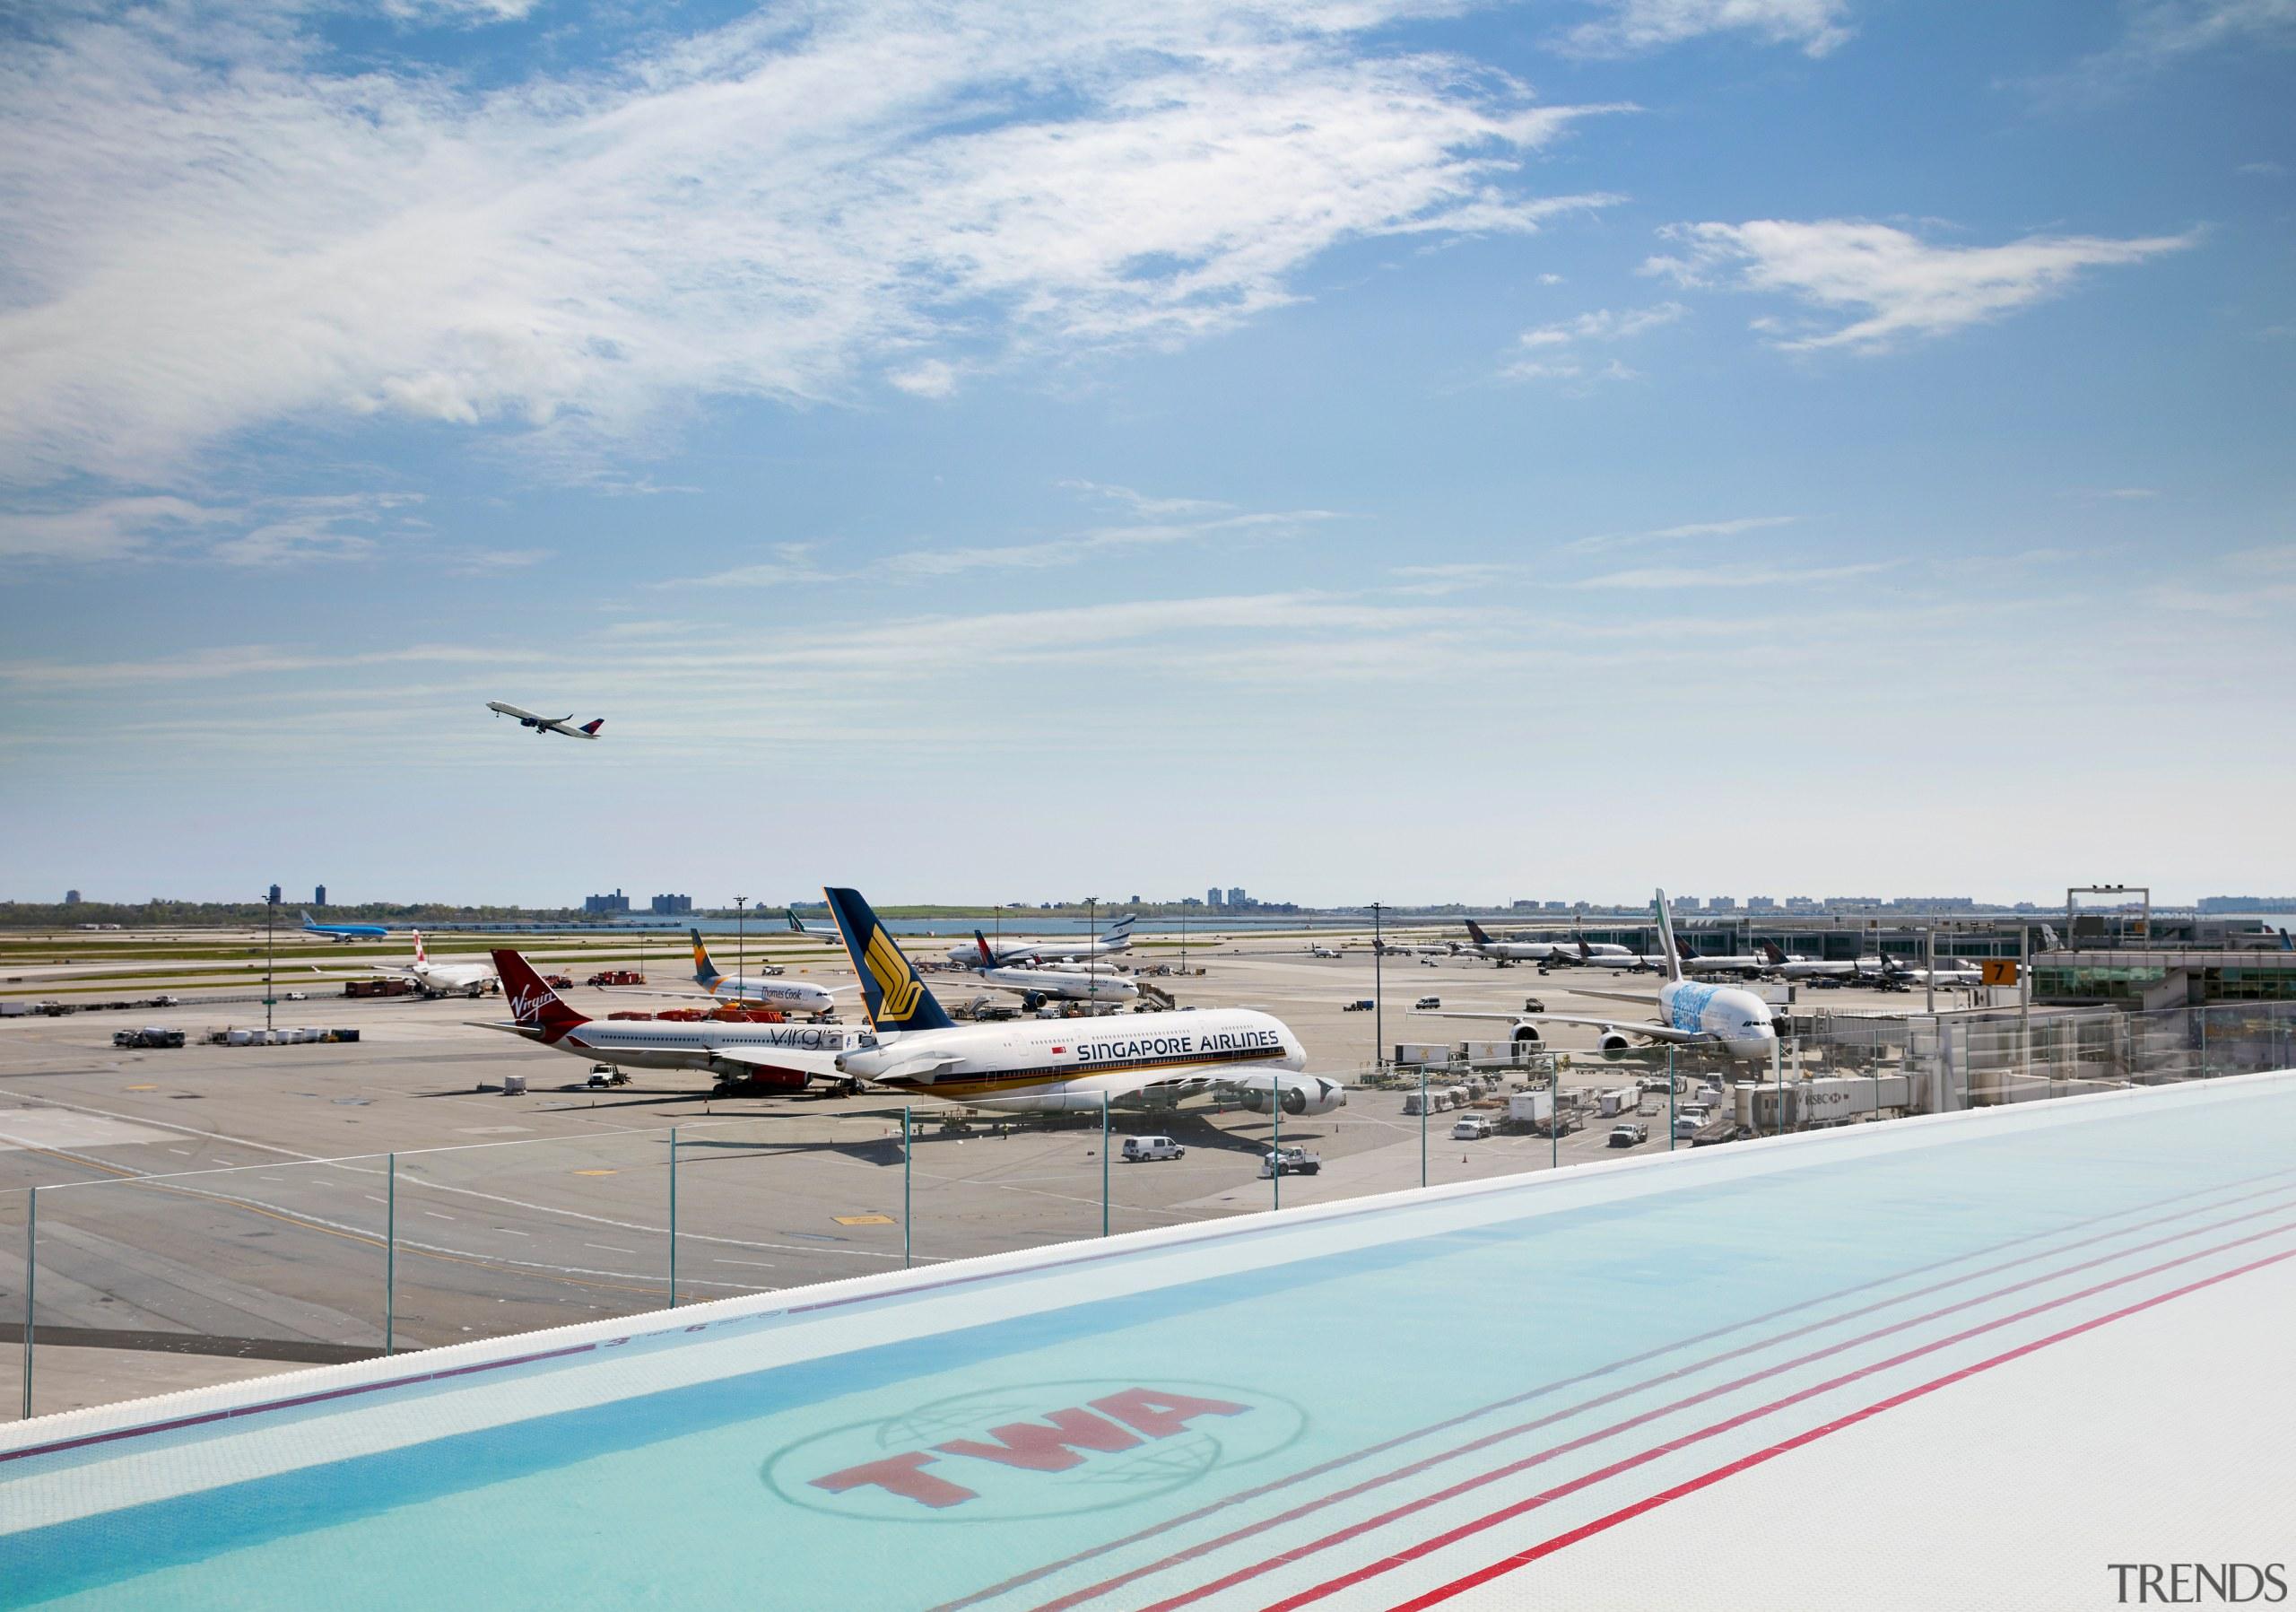 The TWA Hotel's rooftop infinity pool and observation TWA Hotel rooftop pool,  observation deck, JFK runway 4